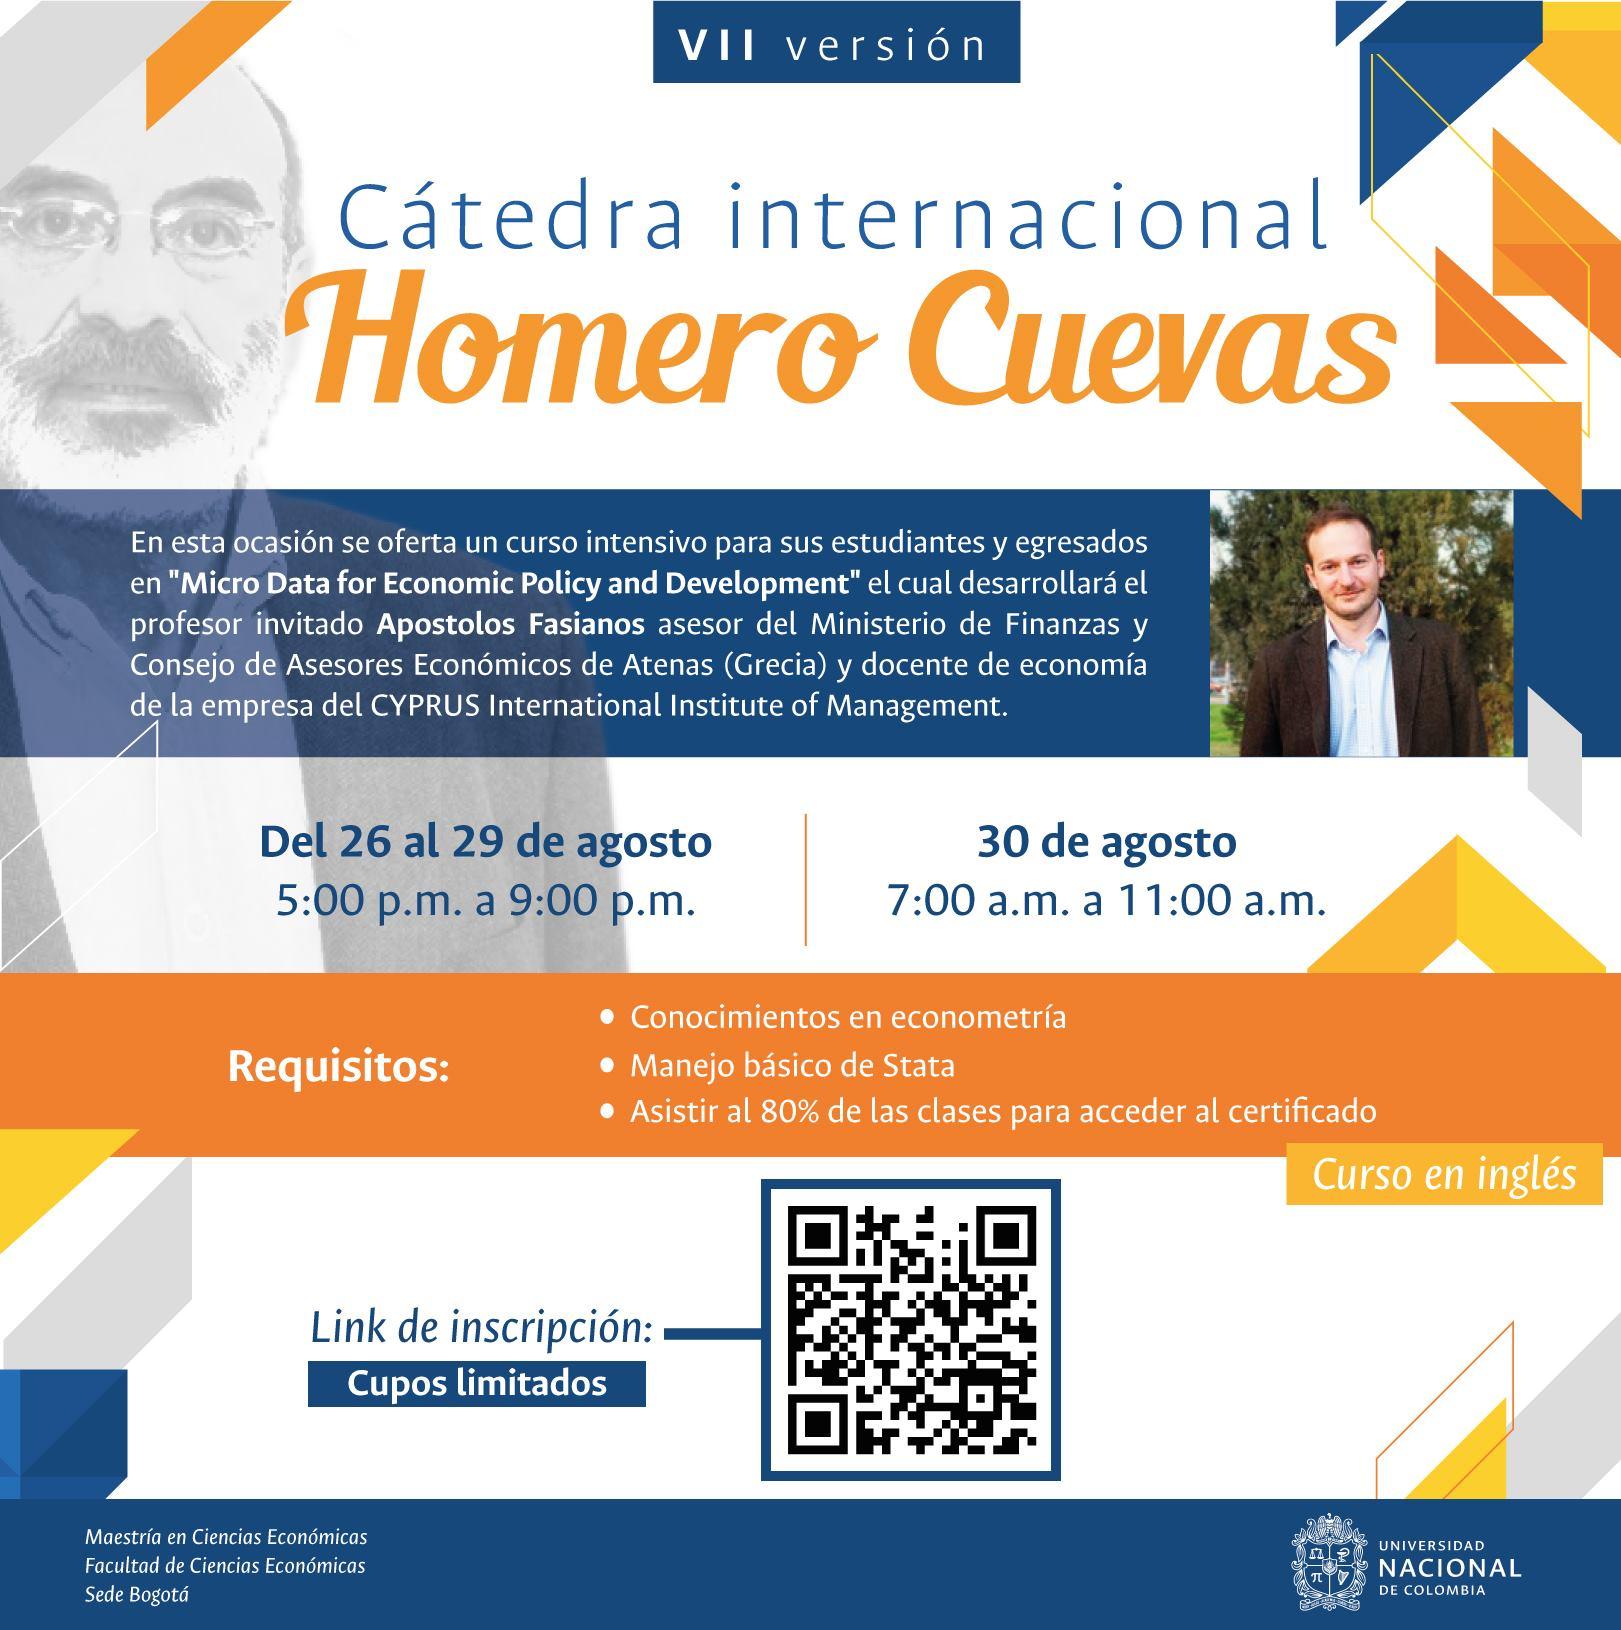 Cátedra Internacional Homero Cuevas 2019: «Micro Data for Economic Policy and Development»